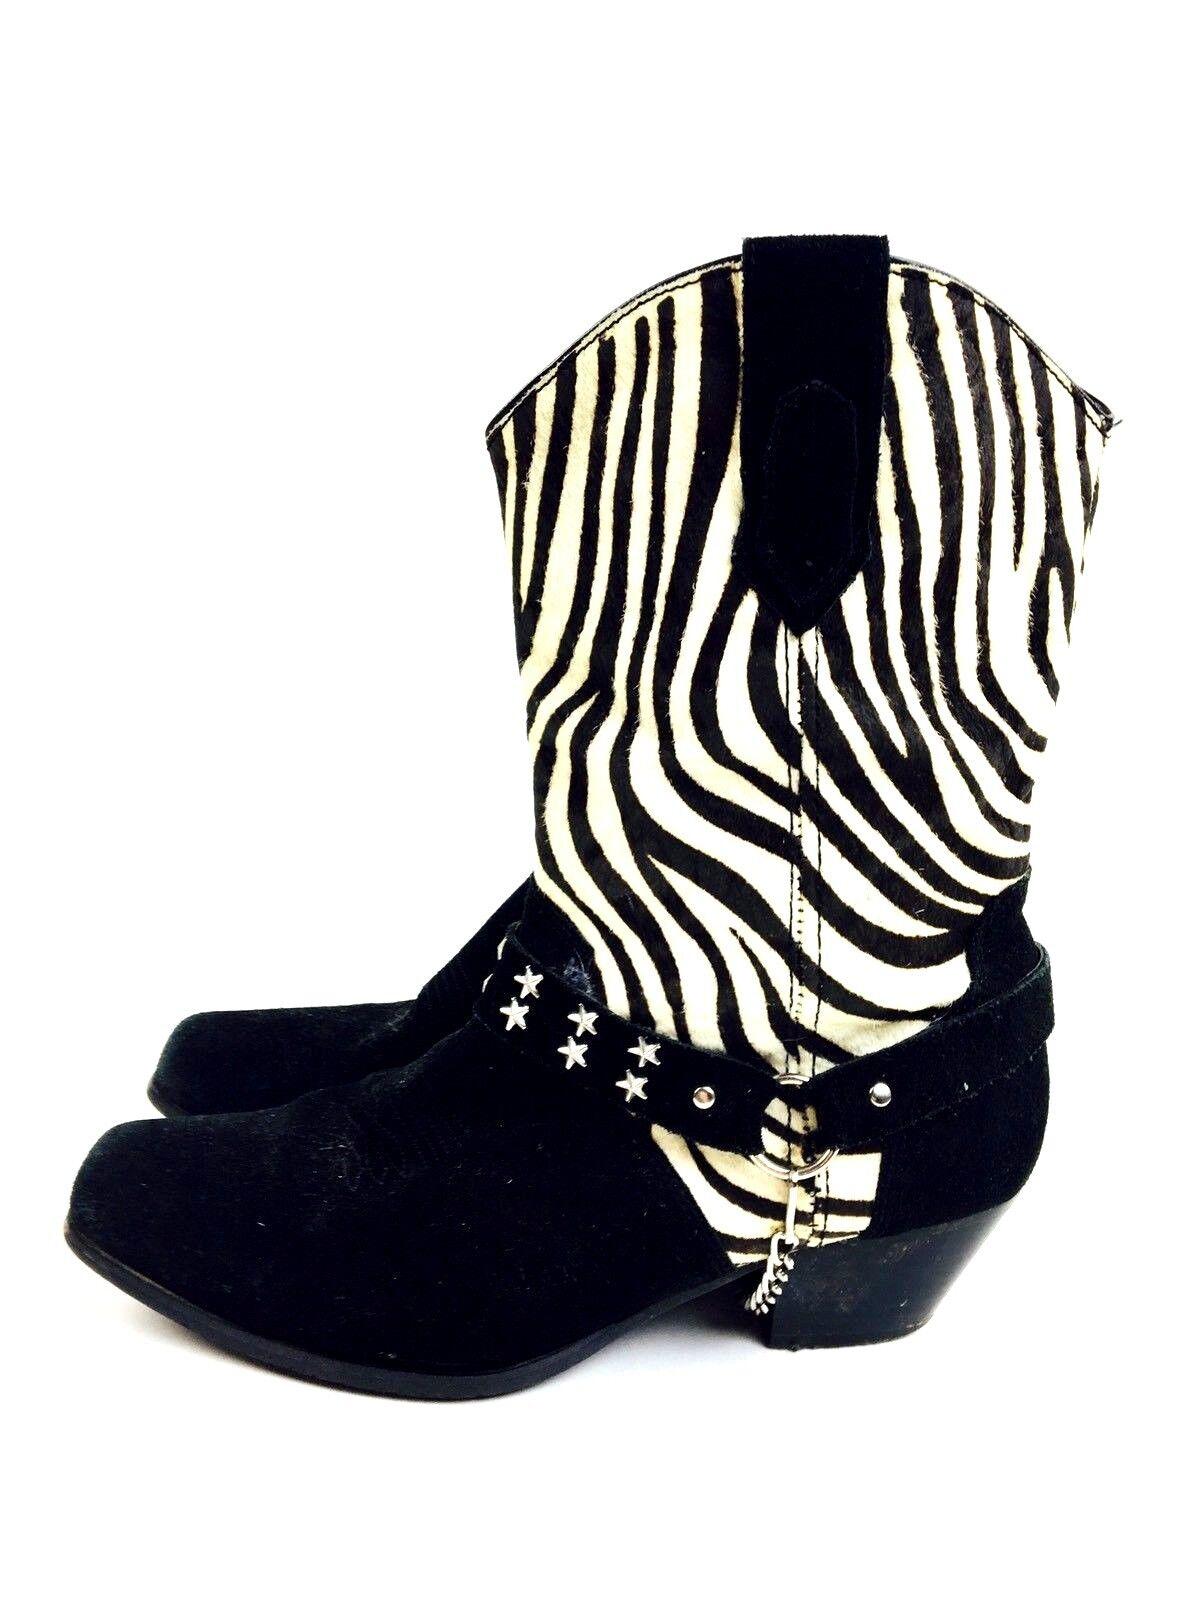 Zebra Cowboy Boots Women's Shoes Women's Boots He… - image 2